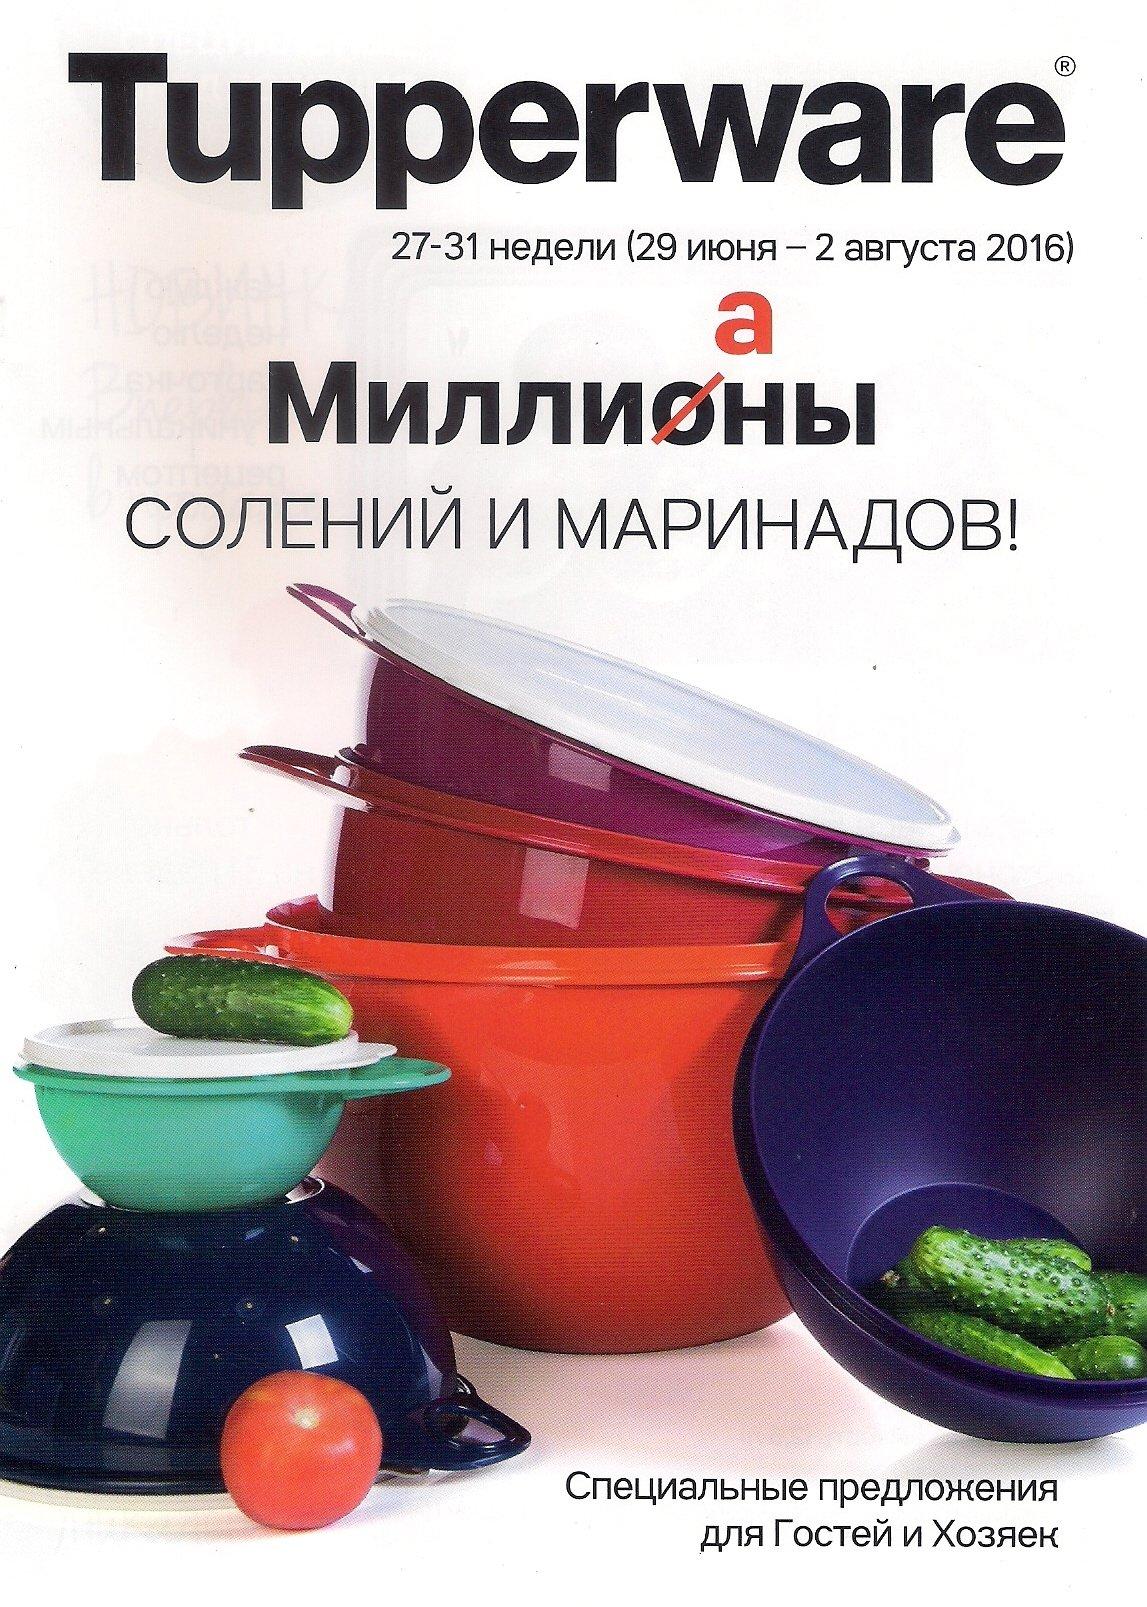 http://tupperware-online.ru/images/upload/1a.jpg